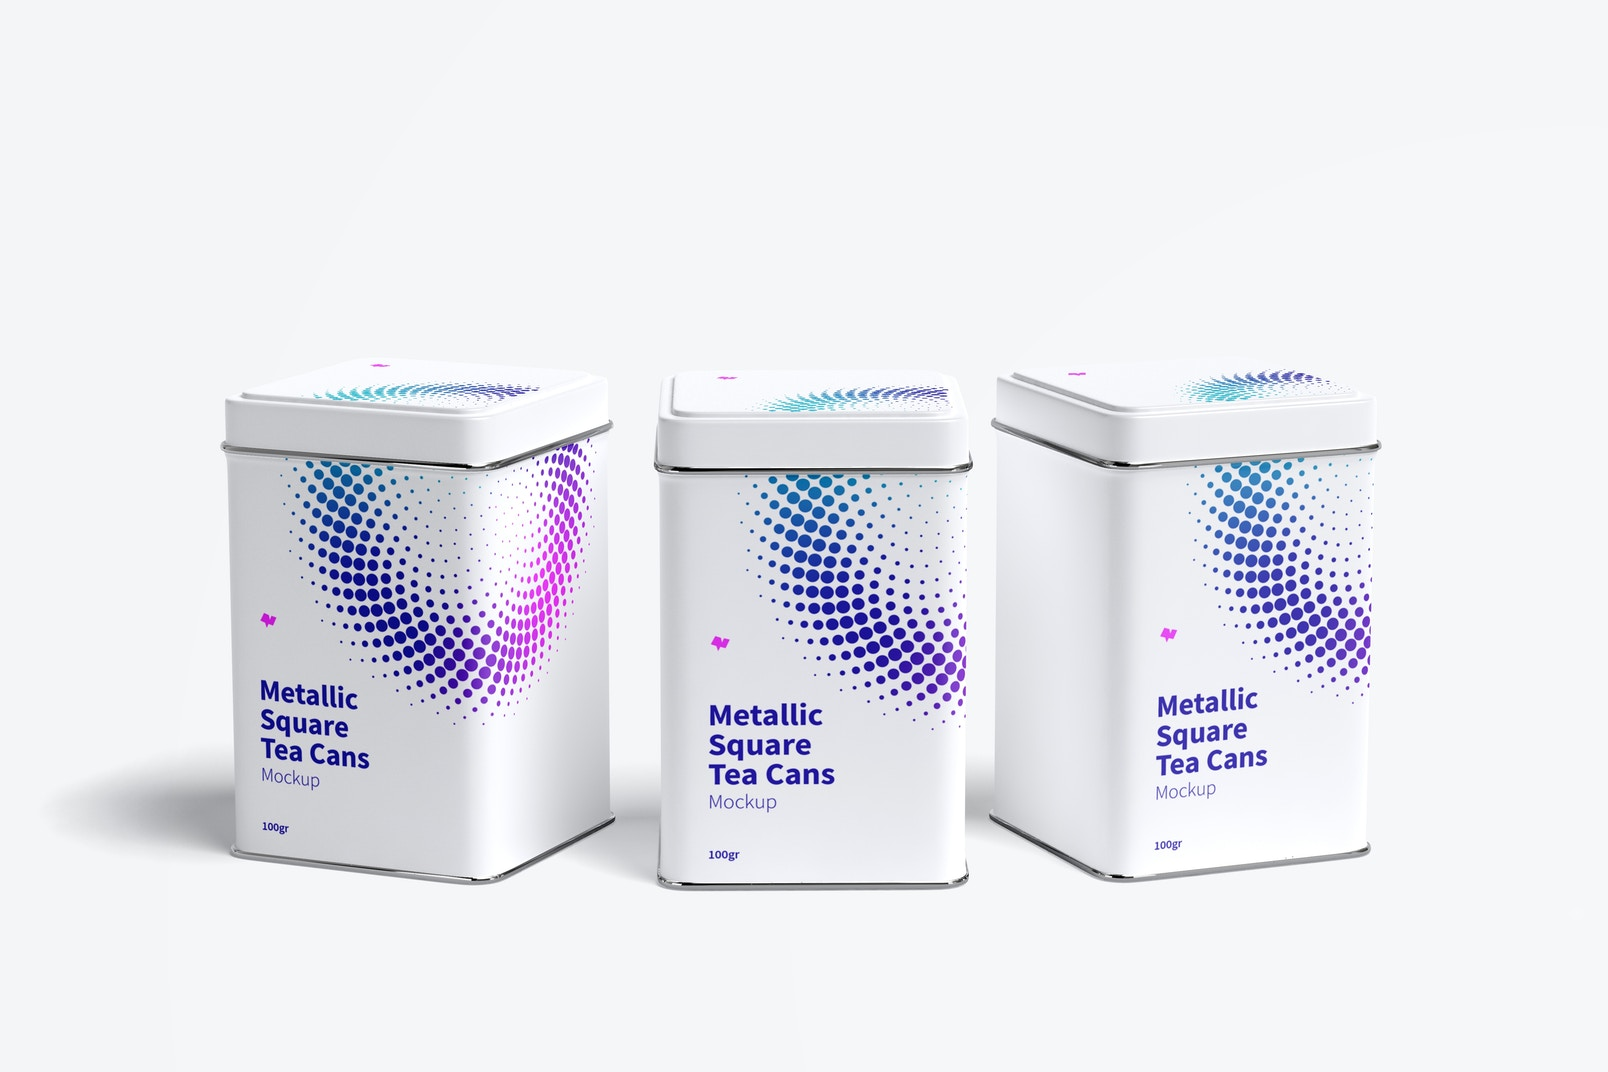 Metallic Square Tea Tin Cans Mockup